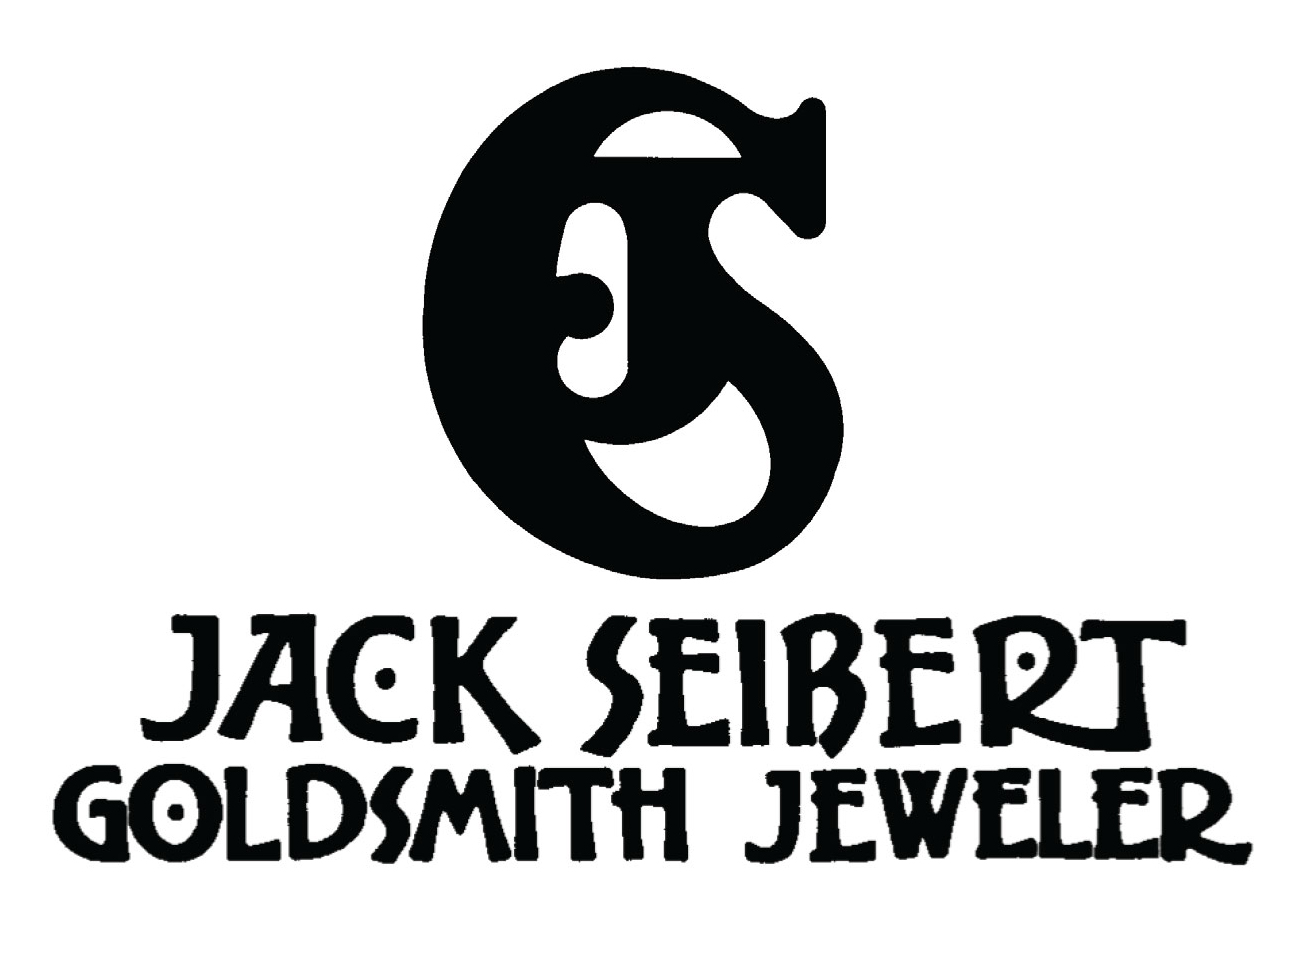 Jack Seibert Goldsmith and Jeweler